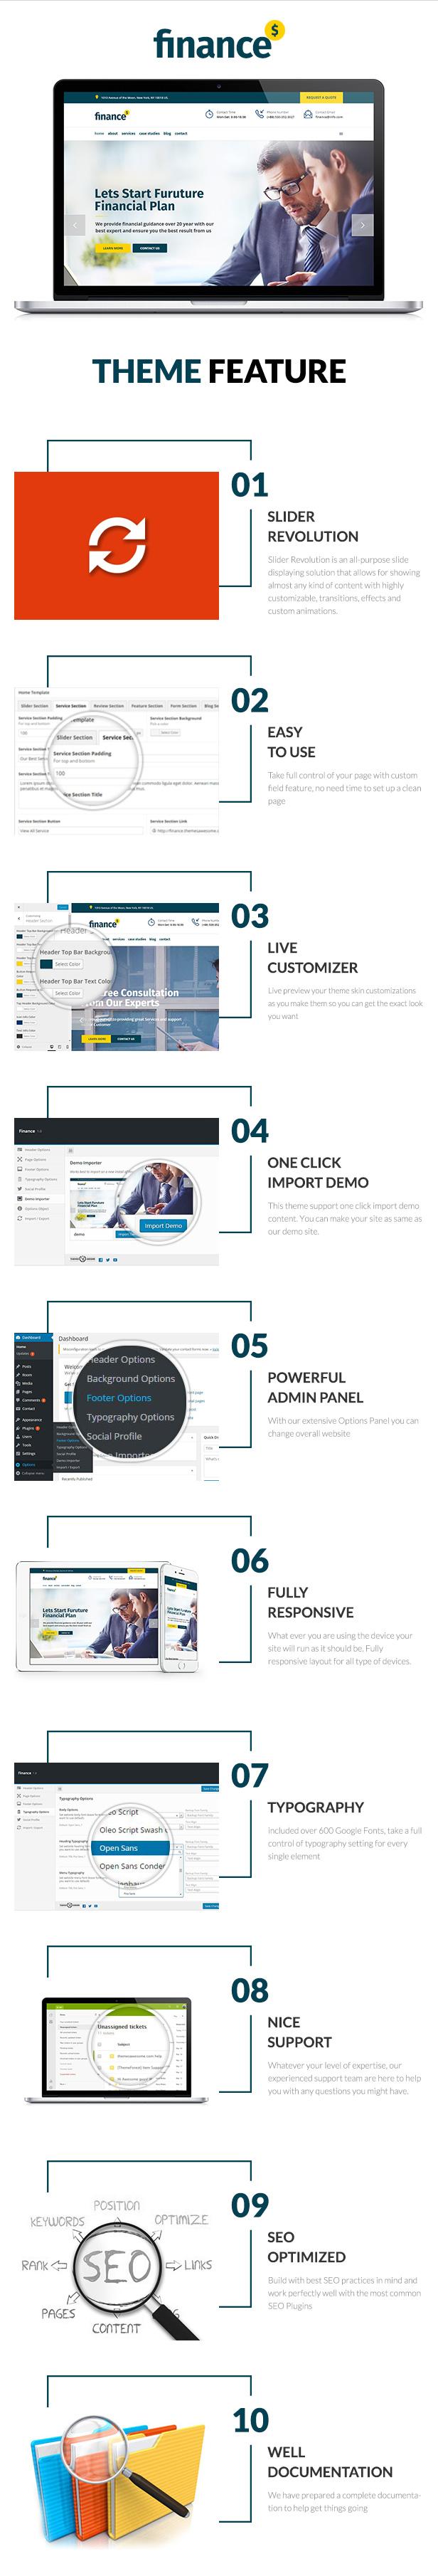 Finance - Business Accounting WordPress Theme - 4